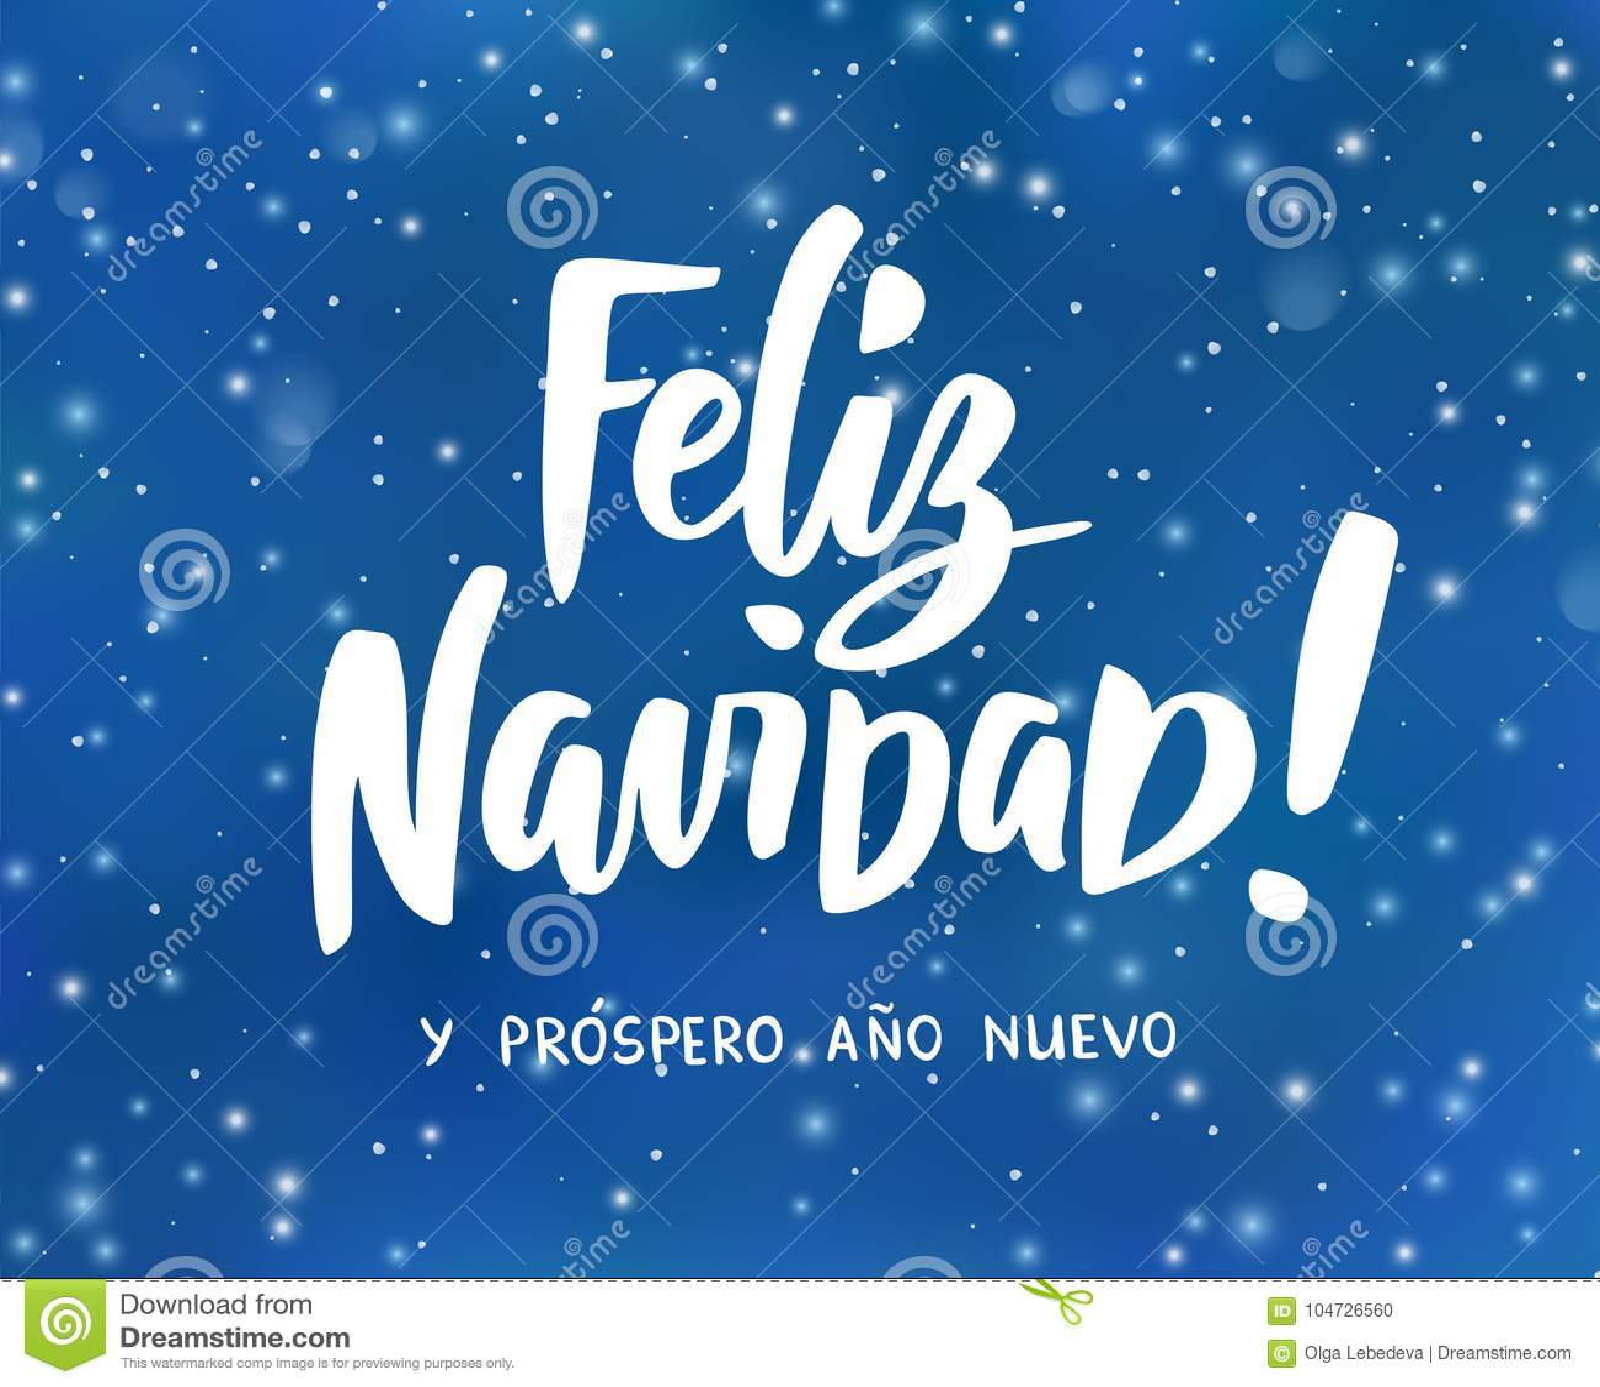 Feliz Navidad Joyeux Noel 2019.Feliz Navidad Y Prospero Ano Nuevo Joyeux Noel Et Bonne